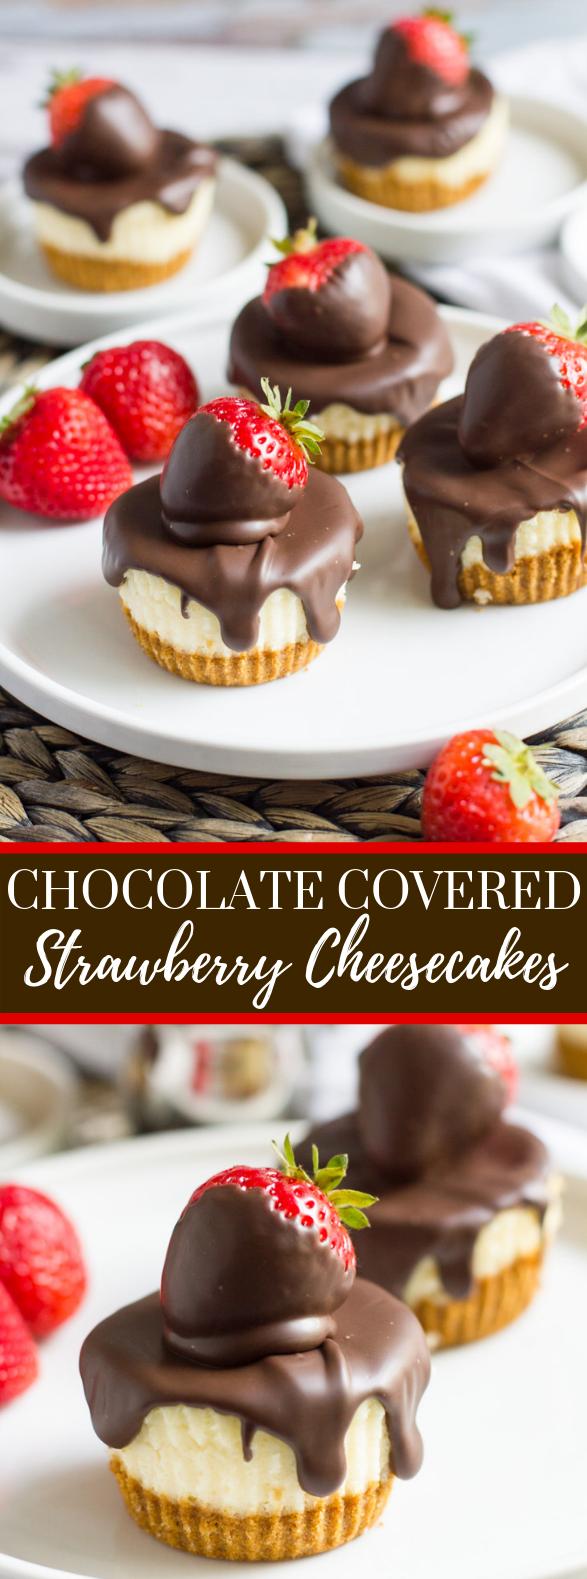 CHOCOLATE COVERED STRAWBERRY CHEESECAKES #dessert #cake